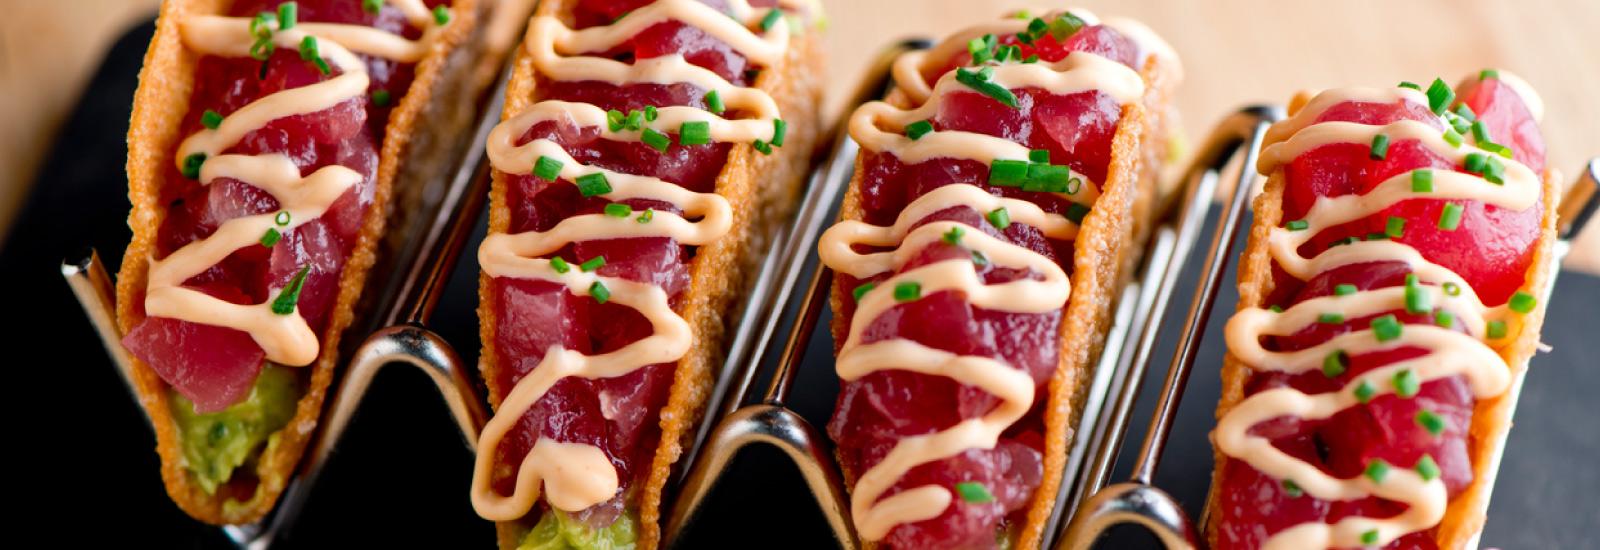 Yelp's Top 8 Santa Maria Restaurants